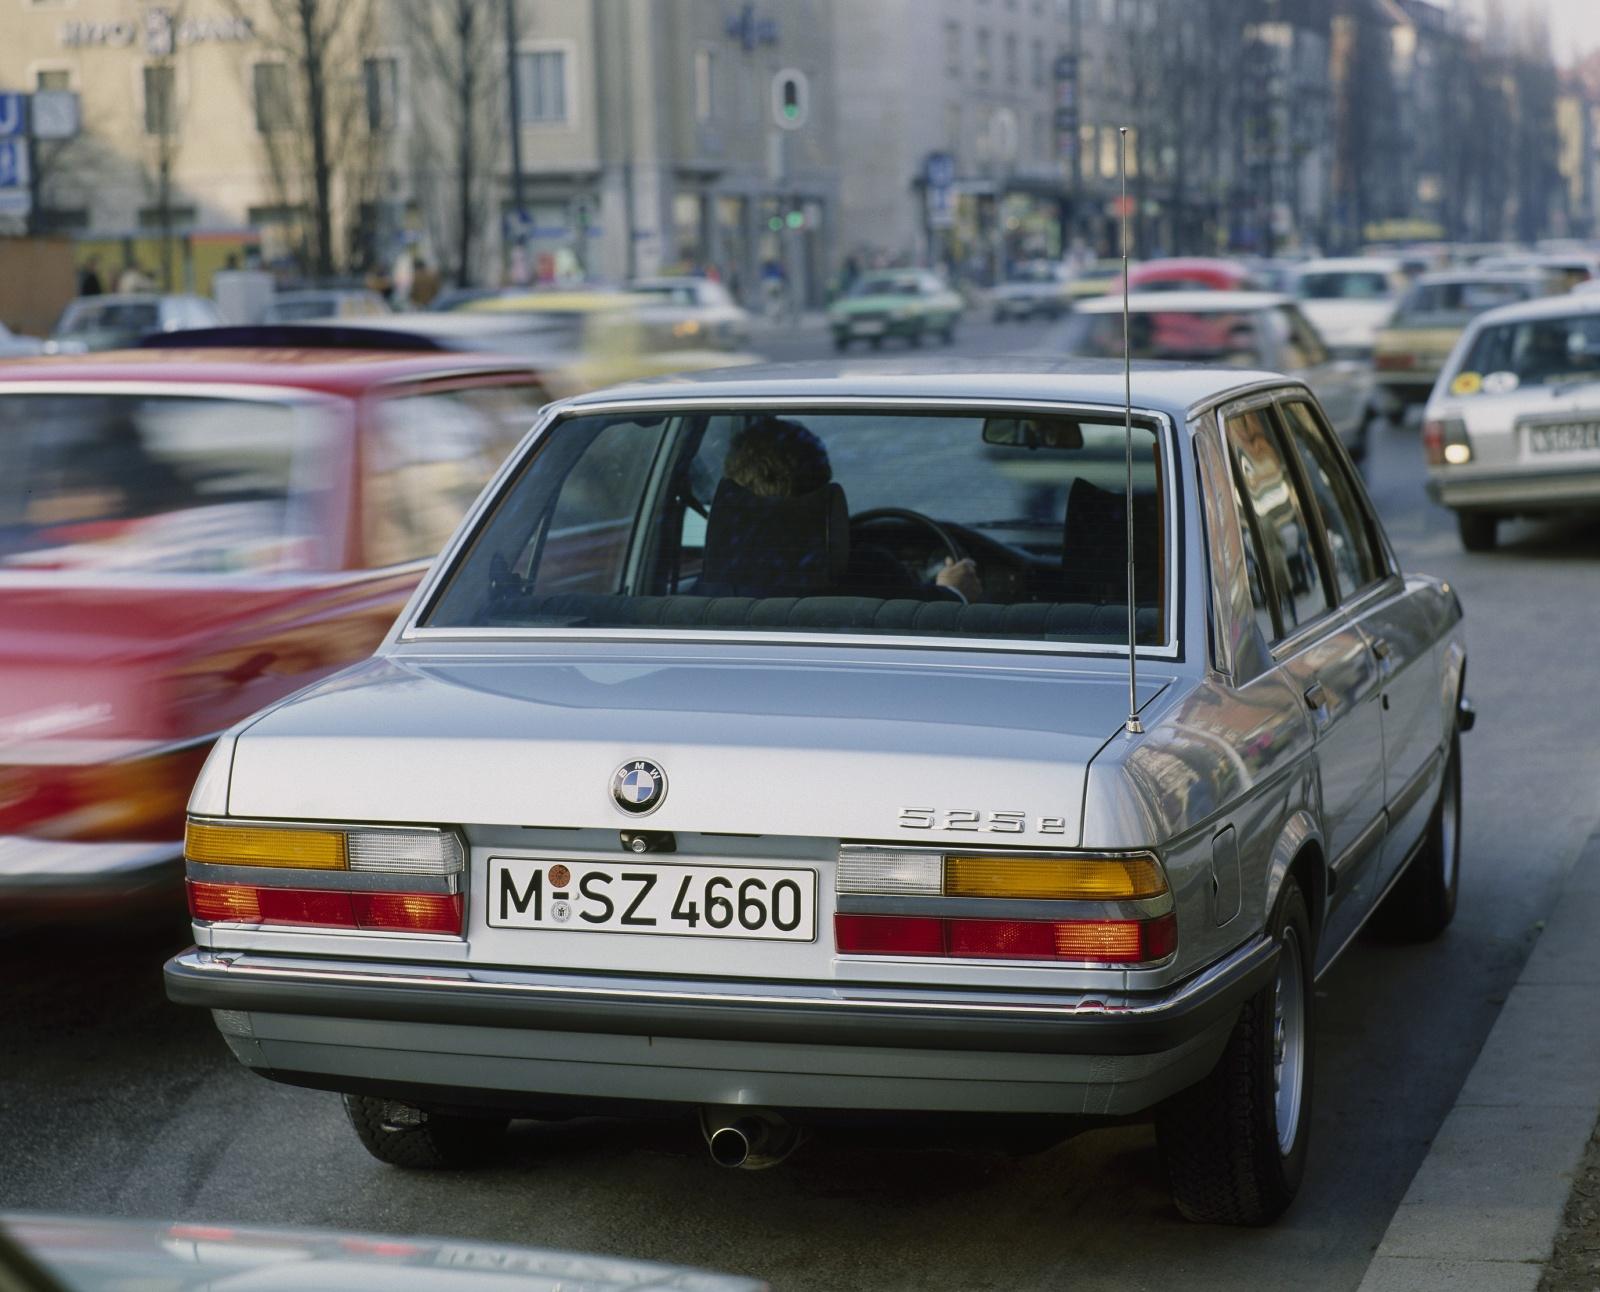 BMW serii 5 E28 - tył, 525e